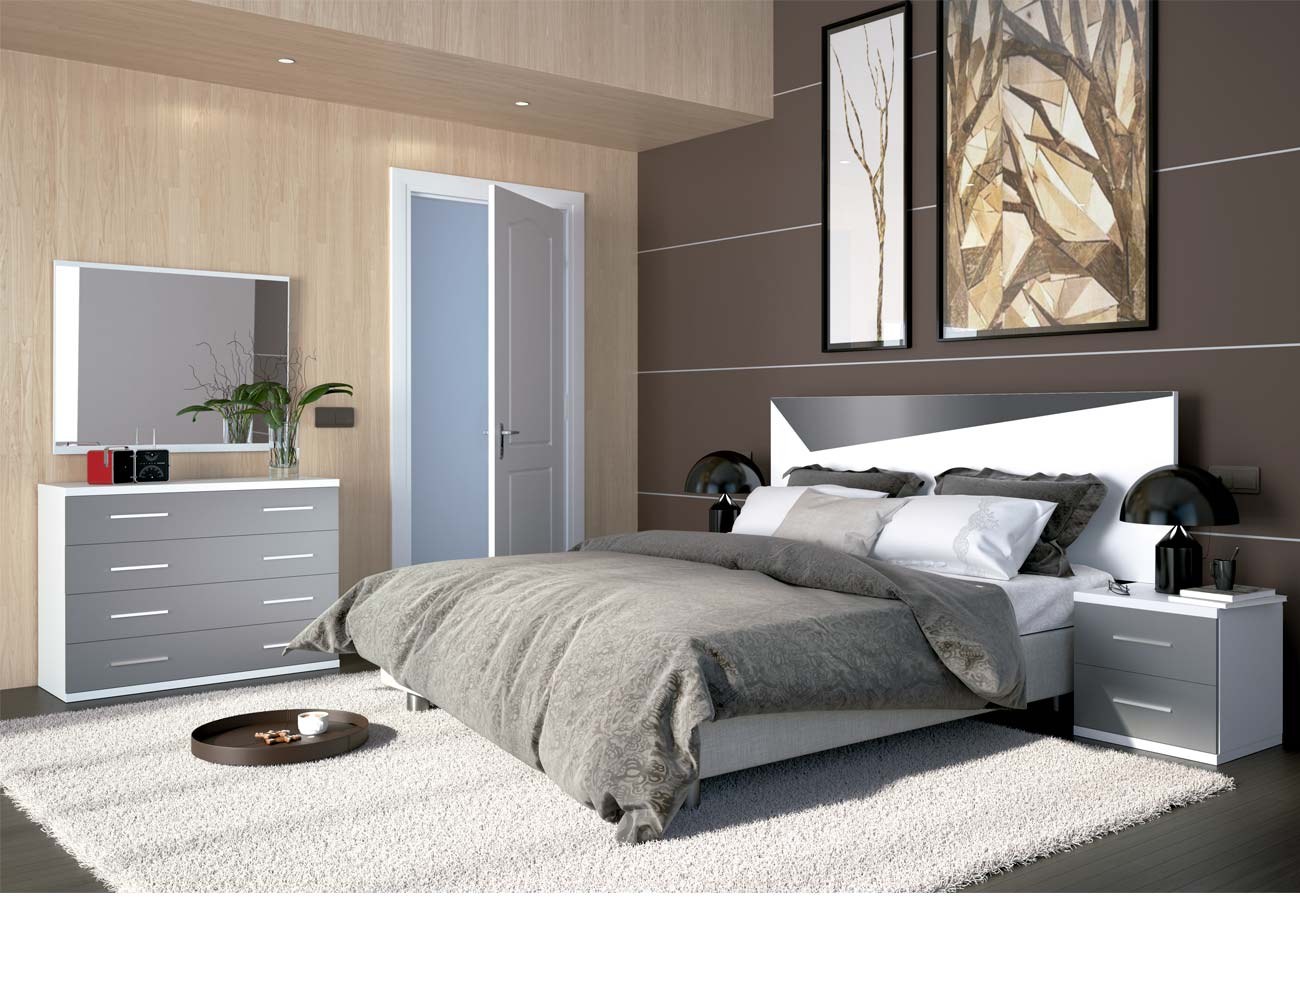 Dormitorio matrimonio moderno 24 blanco gris